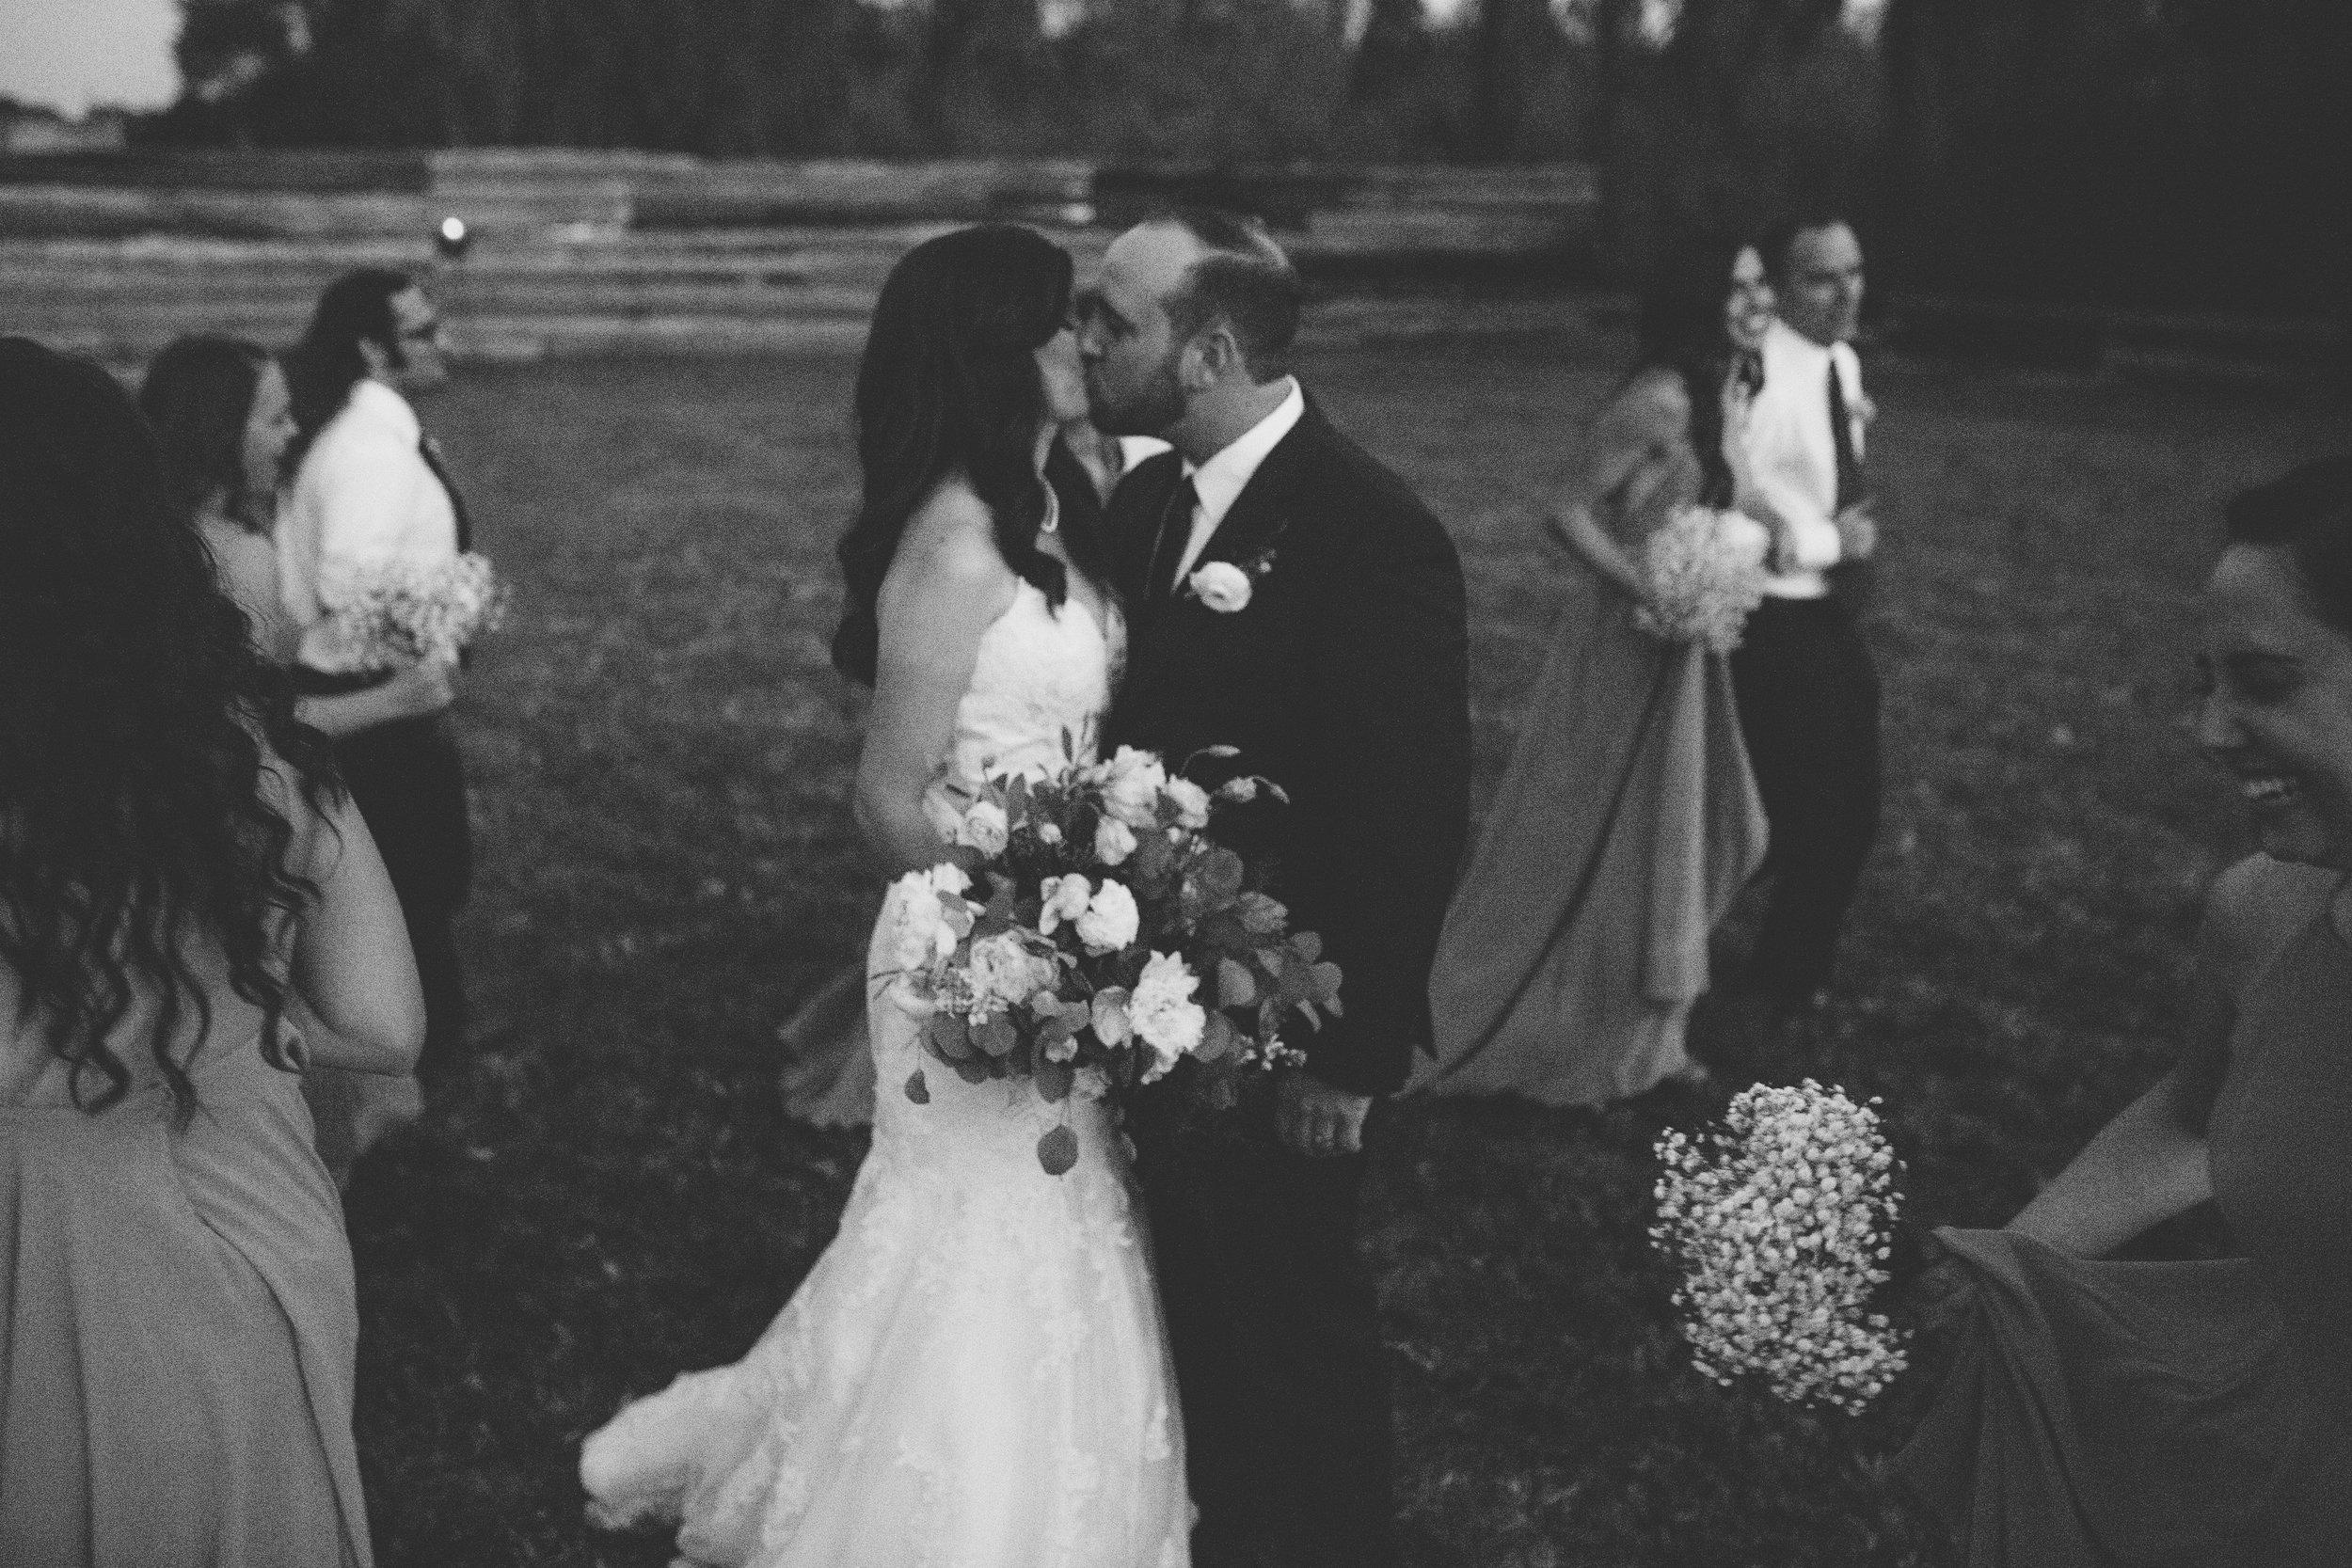 Bridal Party   Florida Rustic Barn Weddings   Plant City, Florida Wedding Photography   Benjamin Hewitt Photographer